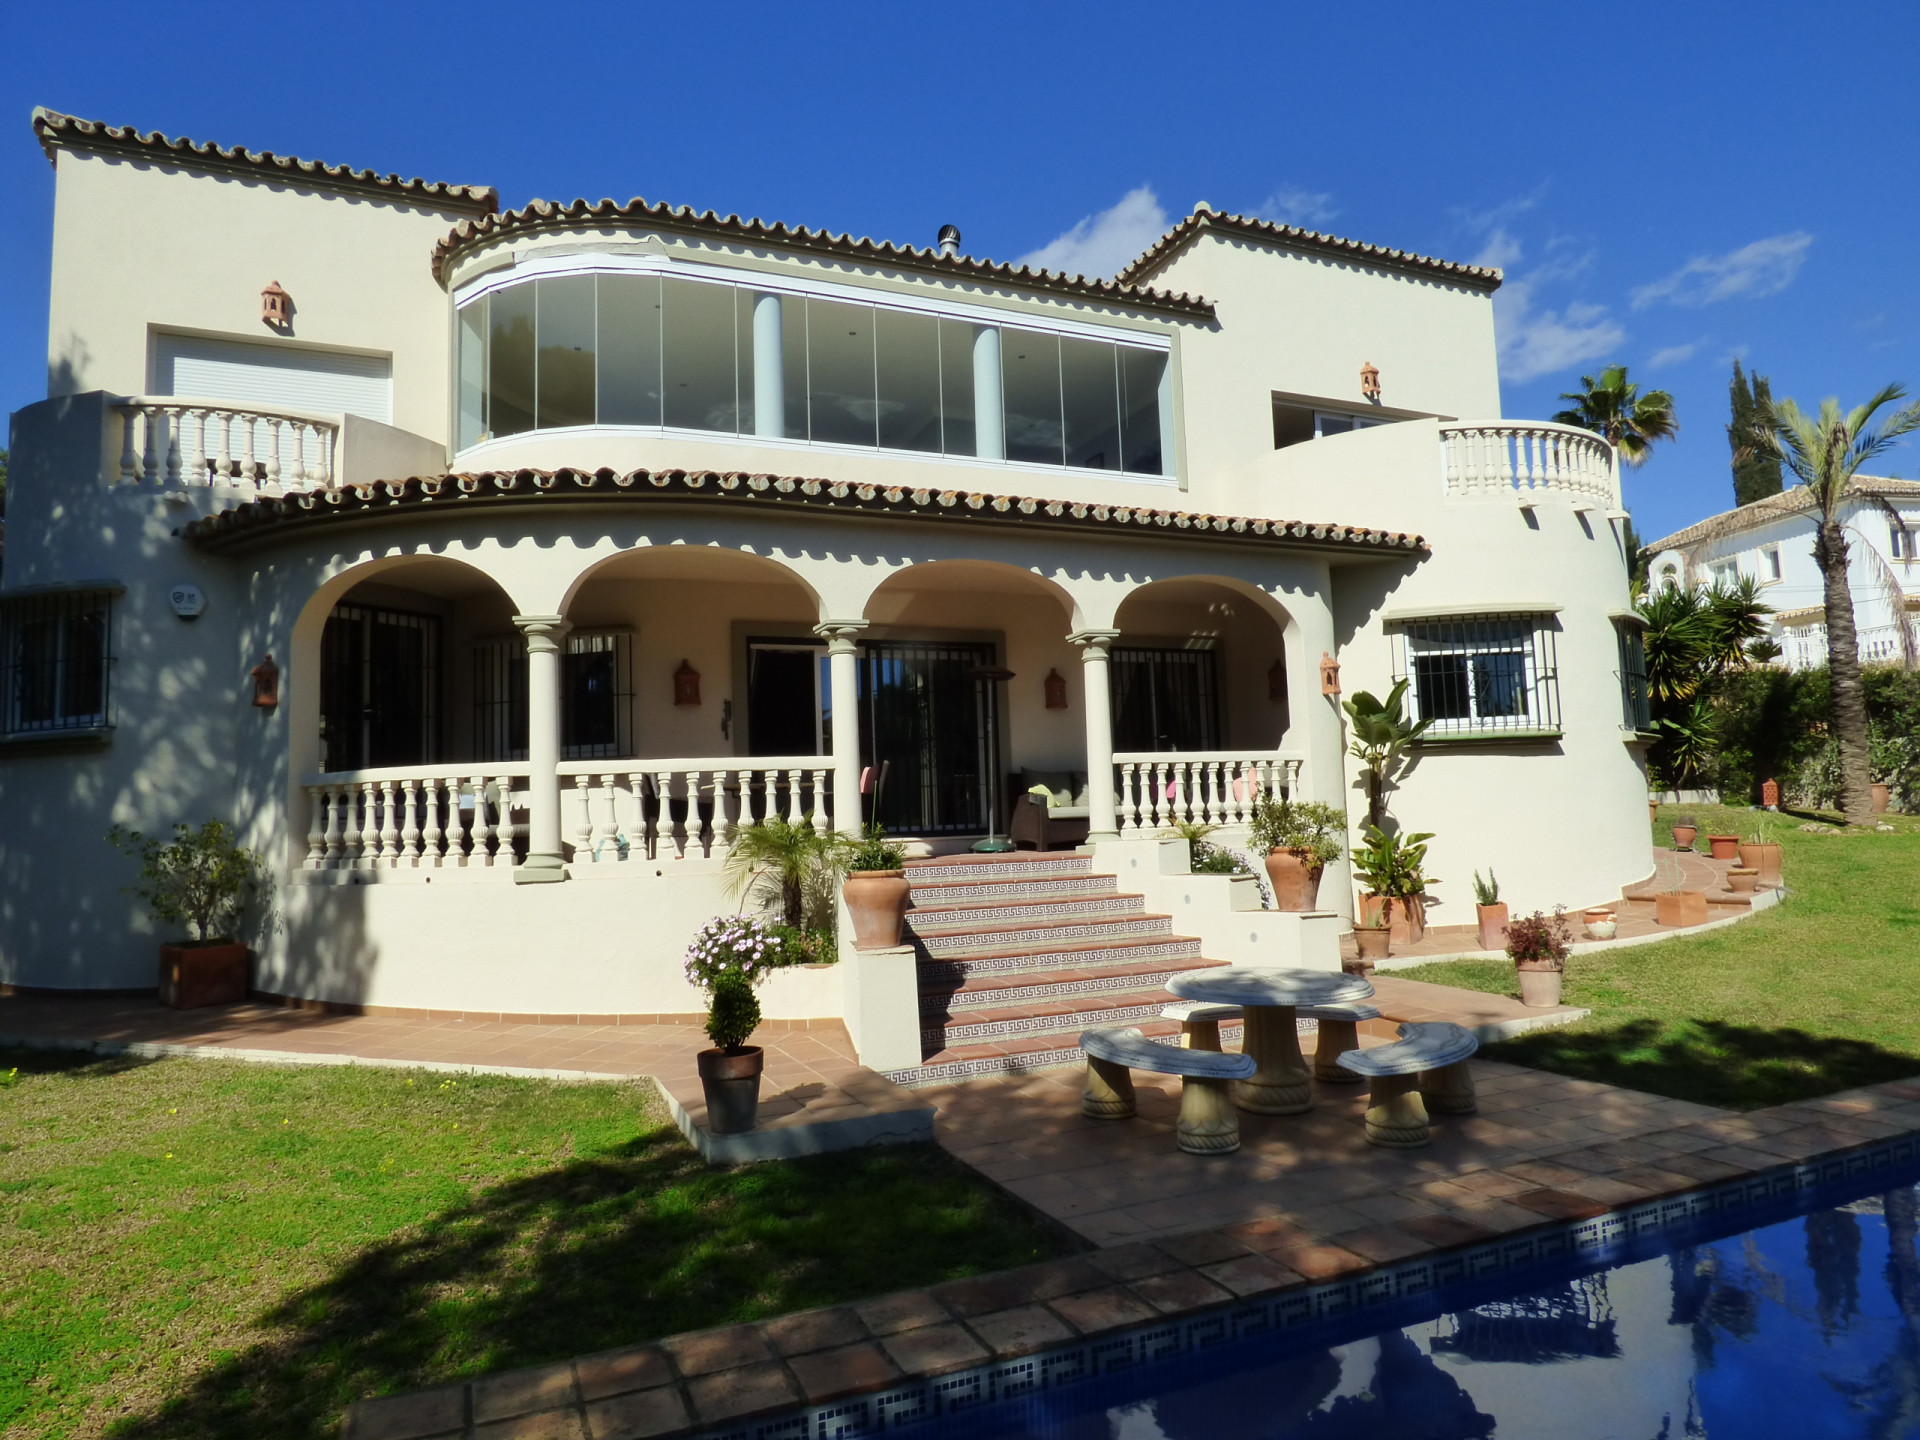 ARFV1963 - Stilvolle Villa zum Verkauf in Strandlage in Marbesa in Marbella-Ost